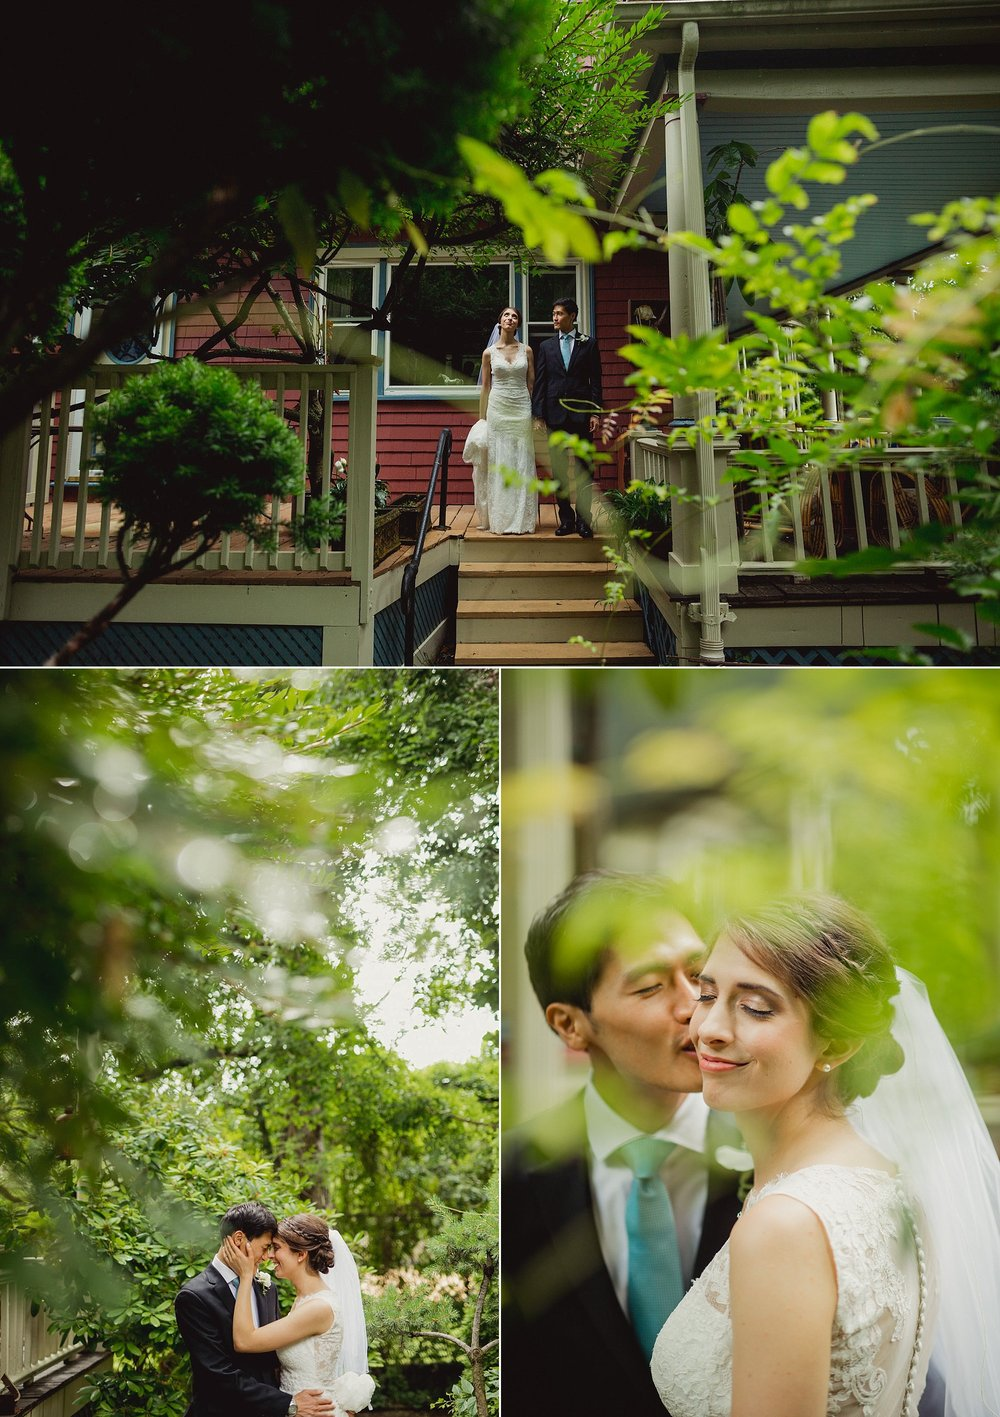 Venezia wedding Boston-20.jpg